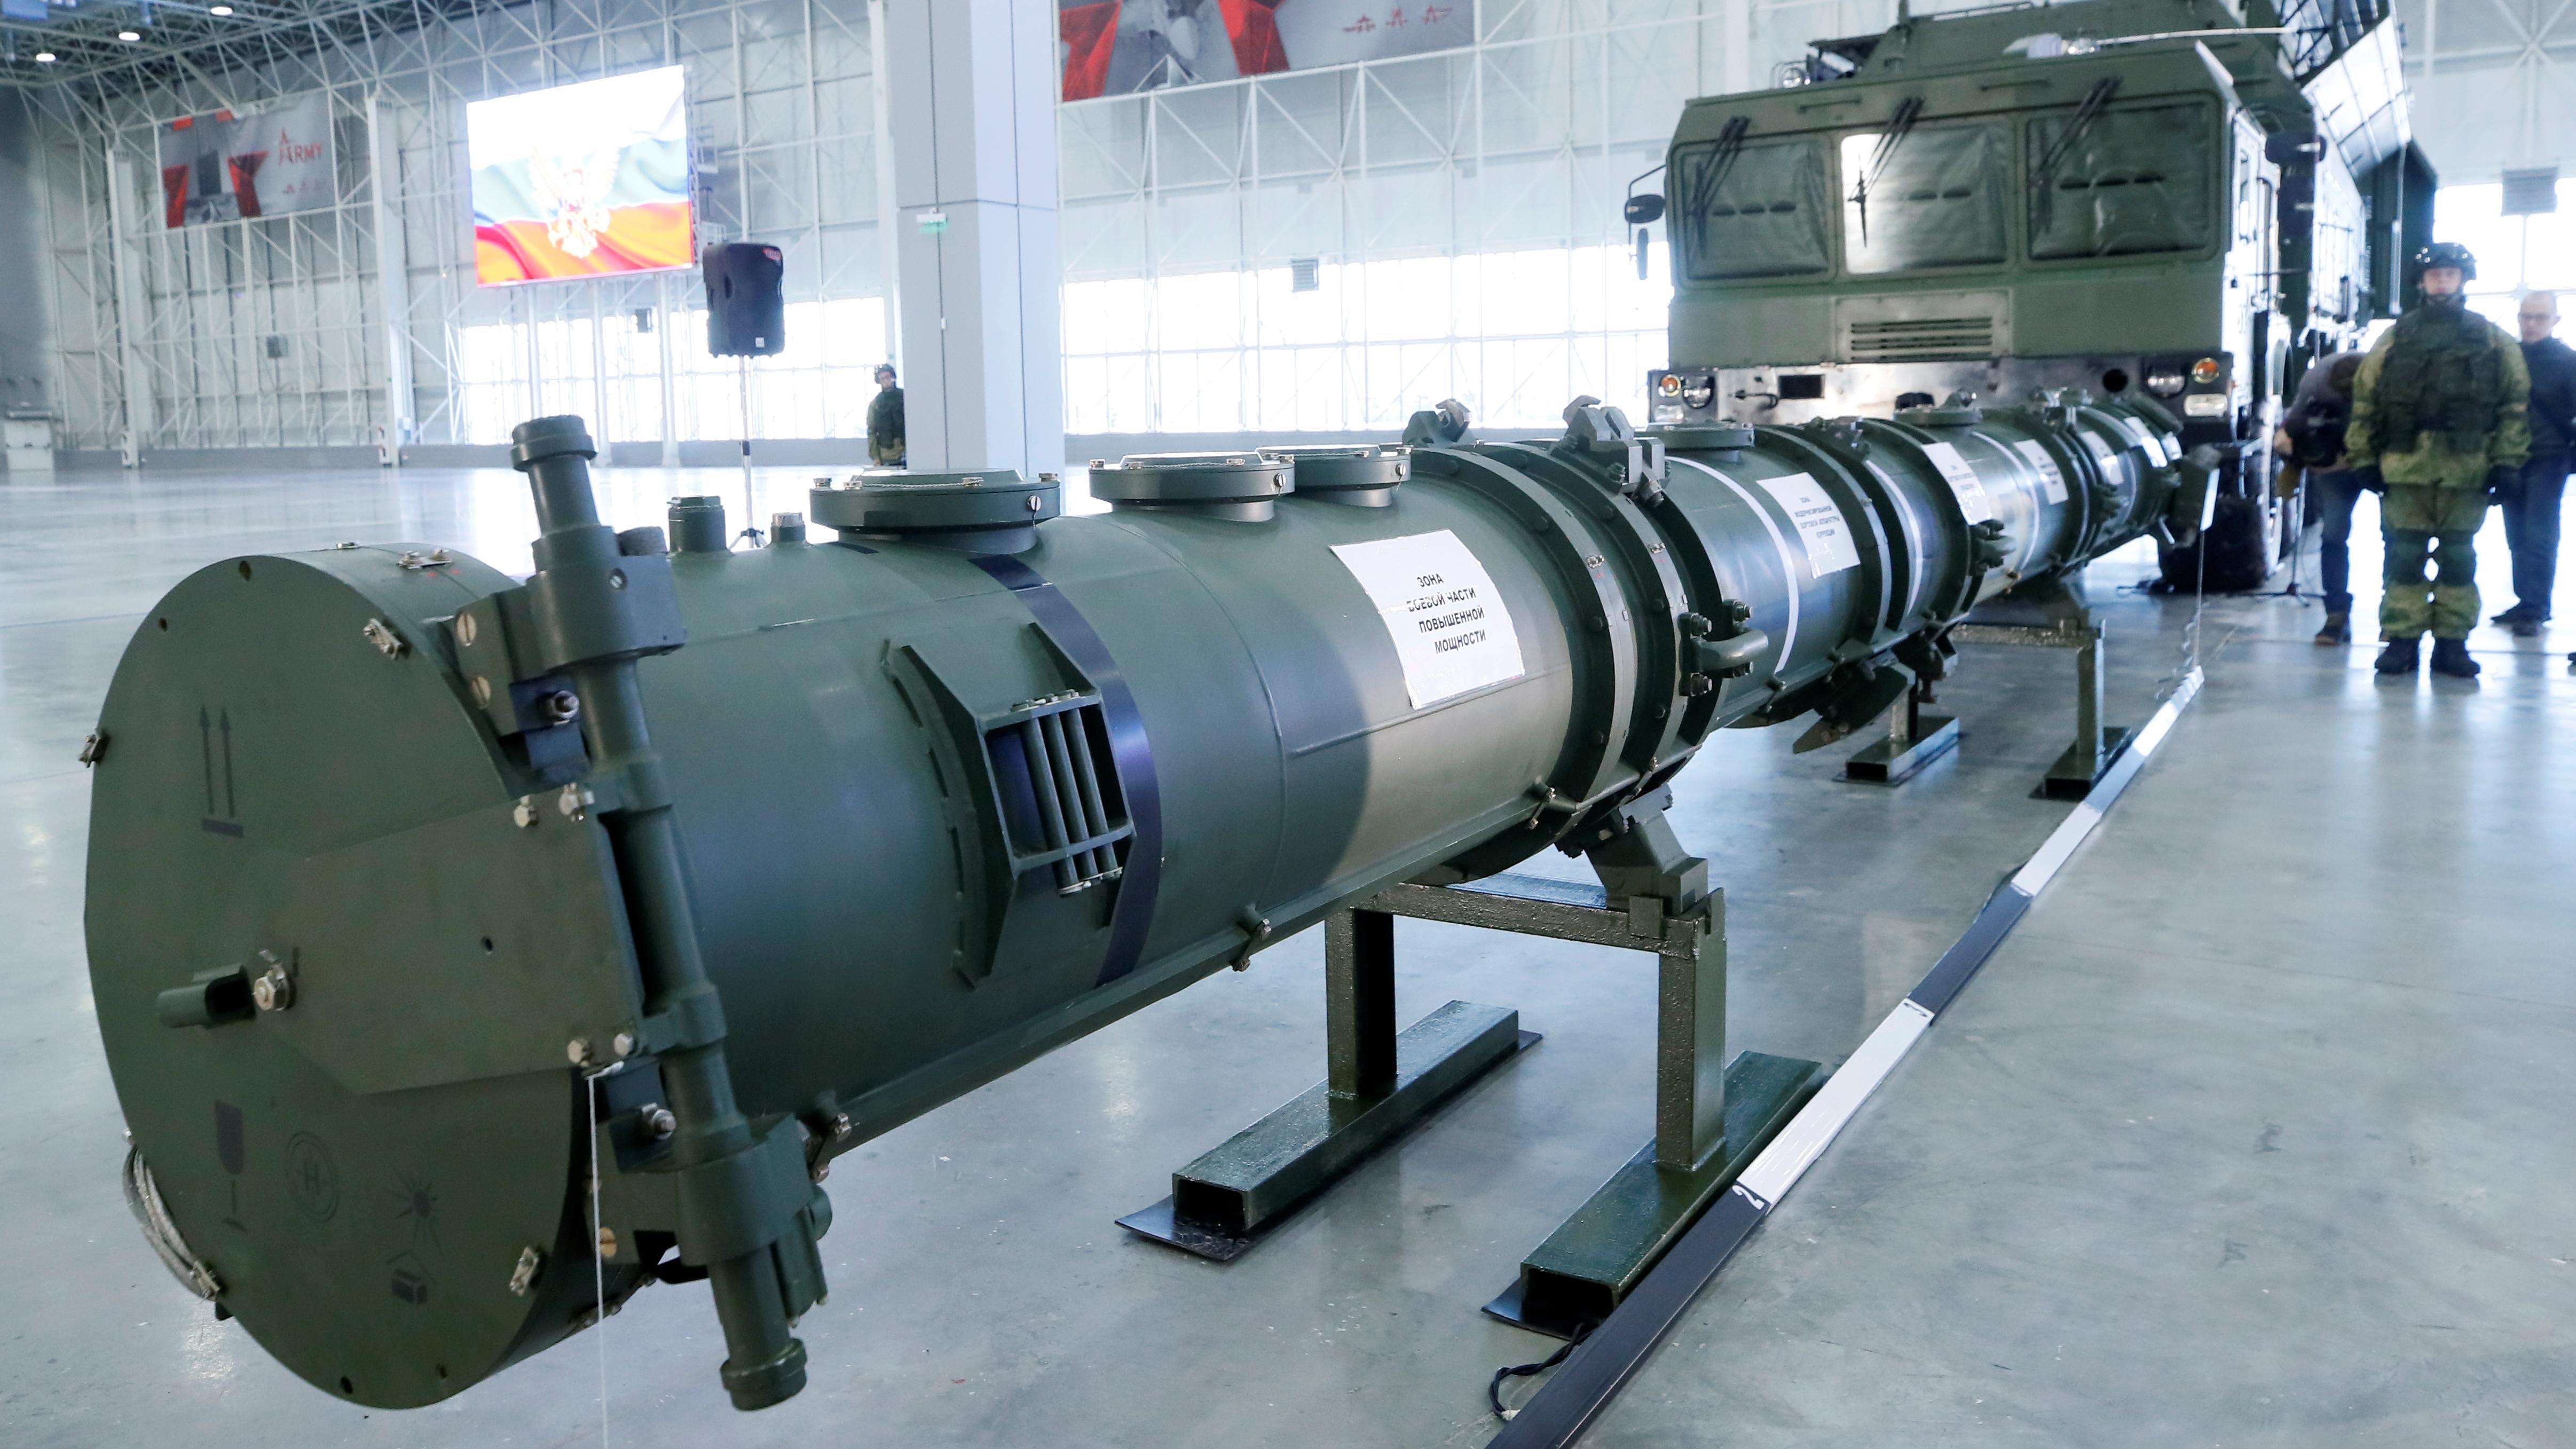 Im Raketenstreit sieht Maas Russland am Zug